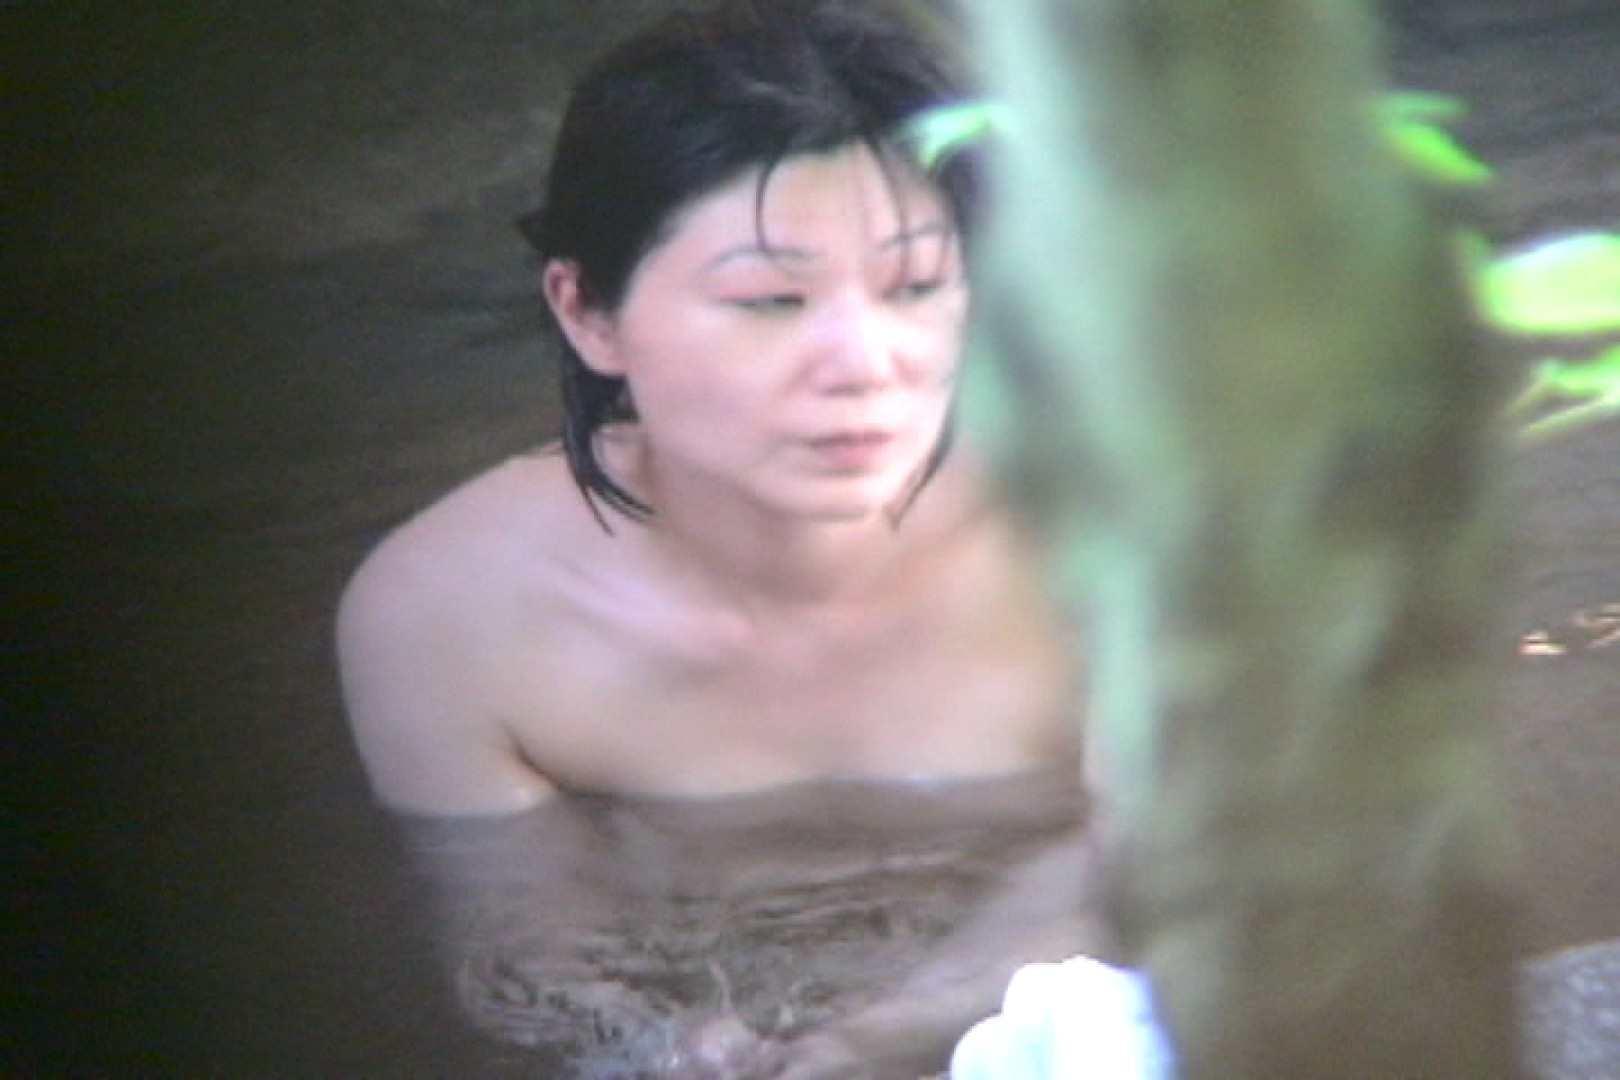 Aquaな露天風呂Vol.449 エッチな盗撮  93pic 48